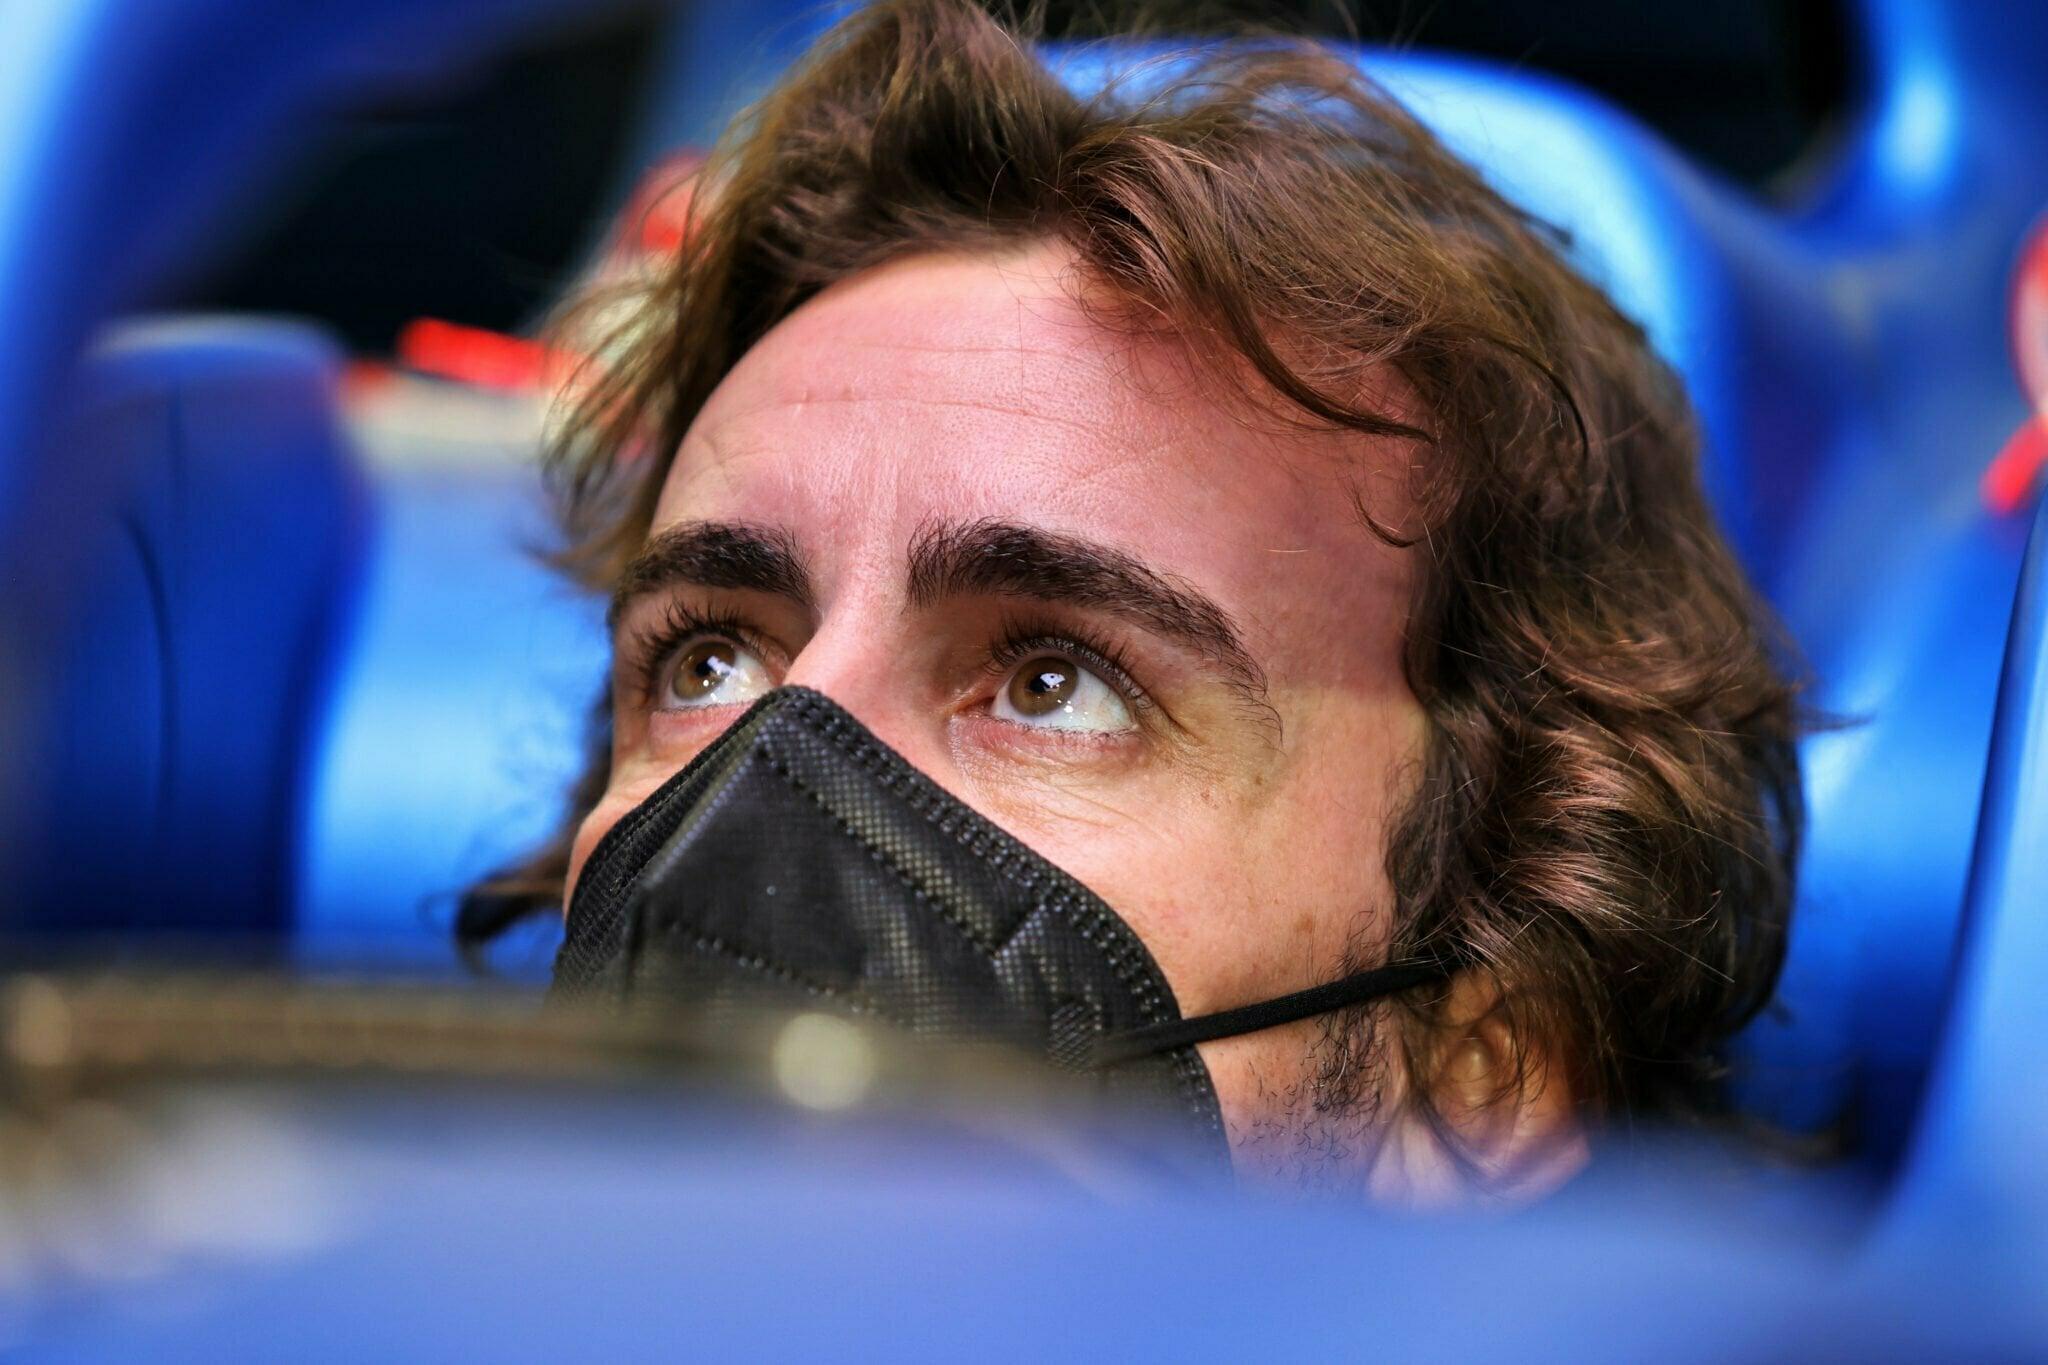 Fernando Alonso Alpine F1 Team Bahrain Sakhir 2021 | Alpine F1 Team : Alonso et Ocon débutent les essais à Bahreïn